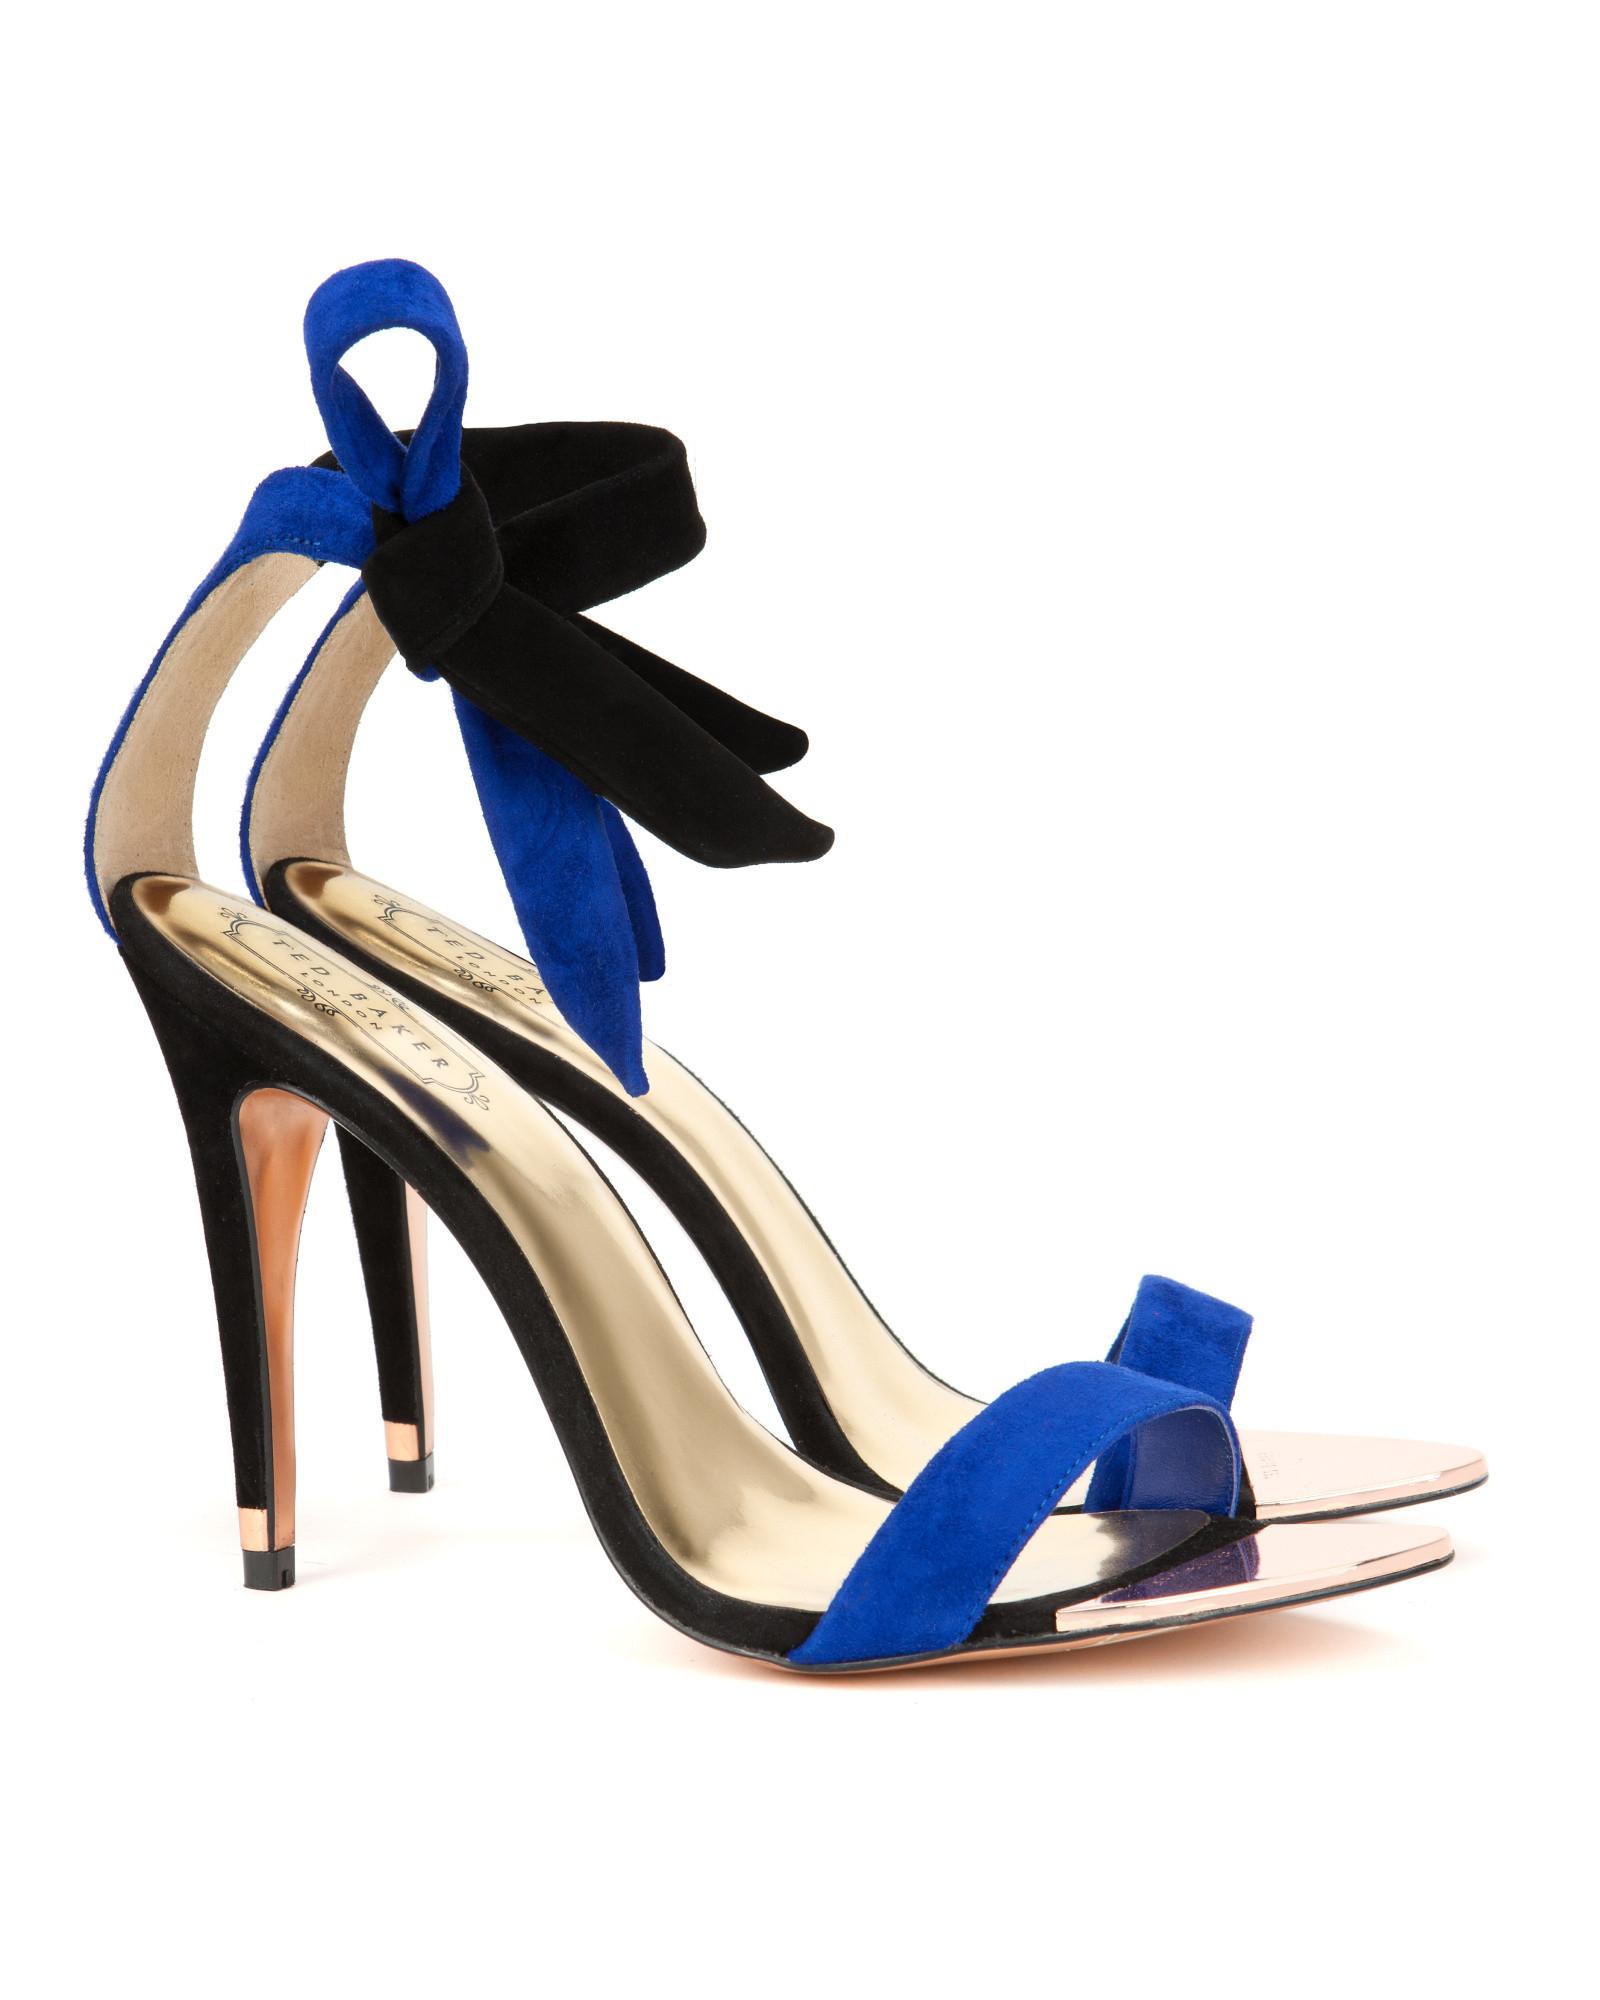 faedc516b41f9 Lyst - Ted Baker Ankle Tie Heels in Blue